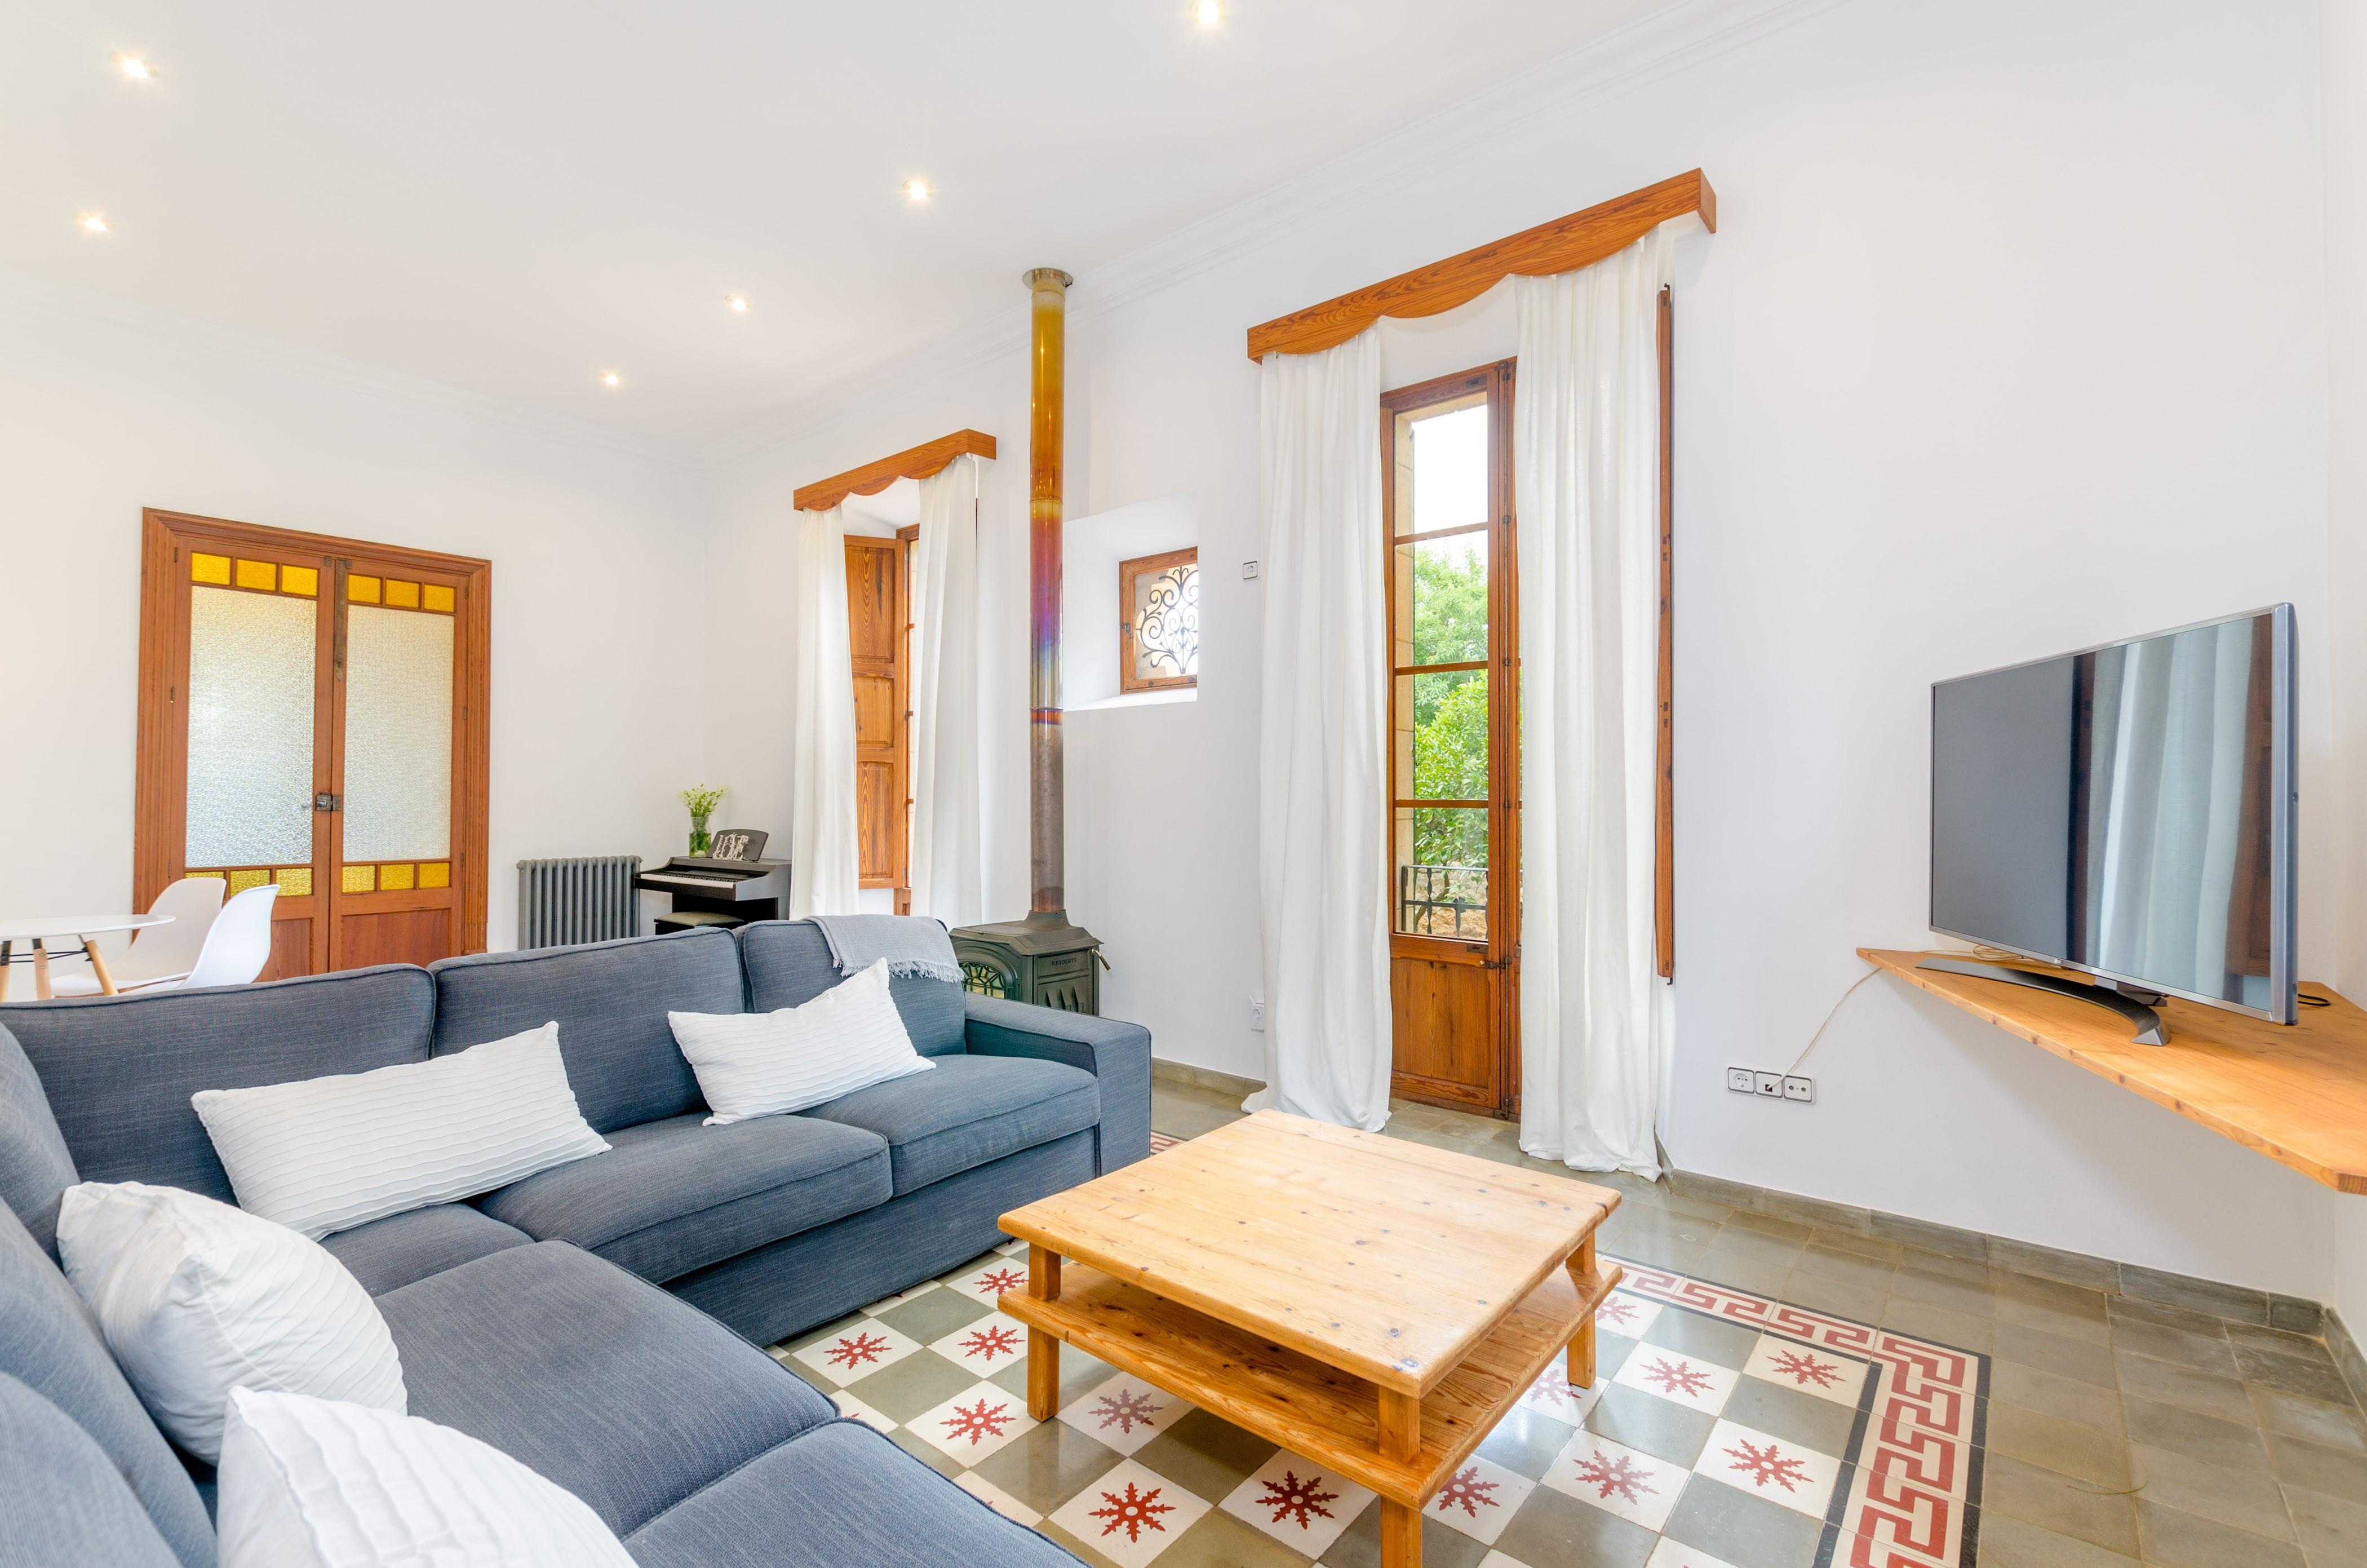 Maison de vacances CAS CONVIDATS (2435013), Alaro, Majorque, Iles Baléares, Espagne, image 16